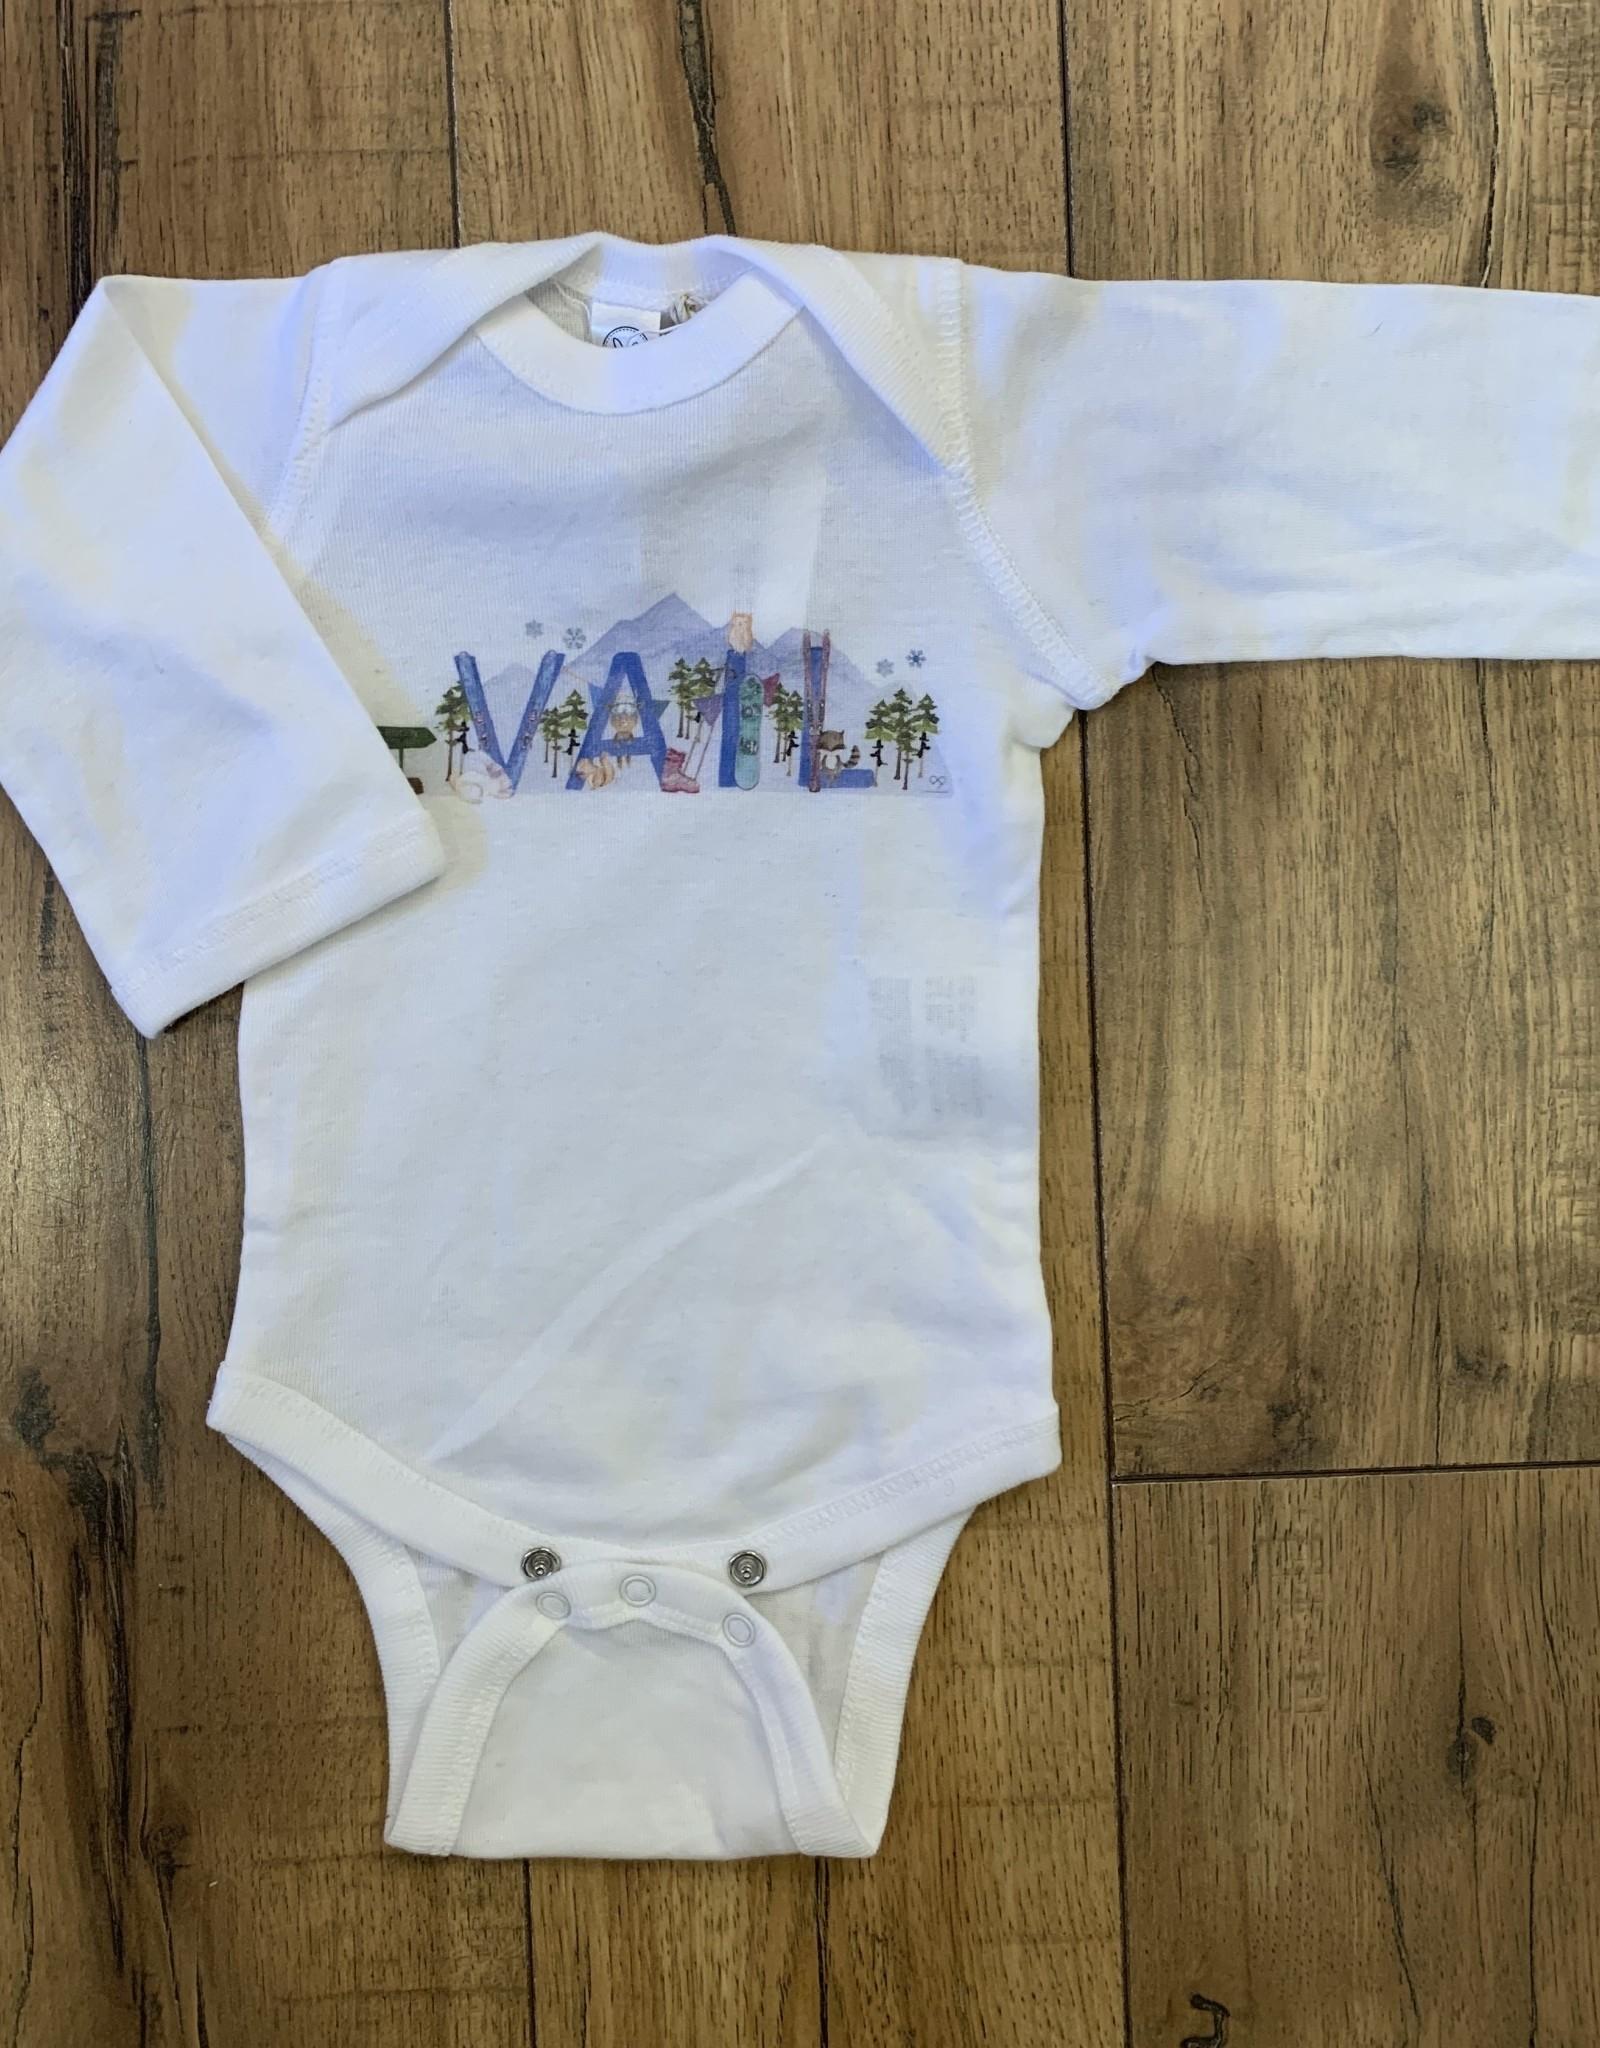 Skipper & Scout Skipper & Scout Vail LS Baby Rib Bodysuit